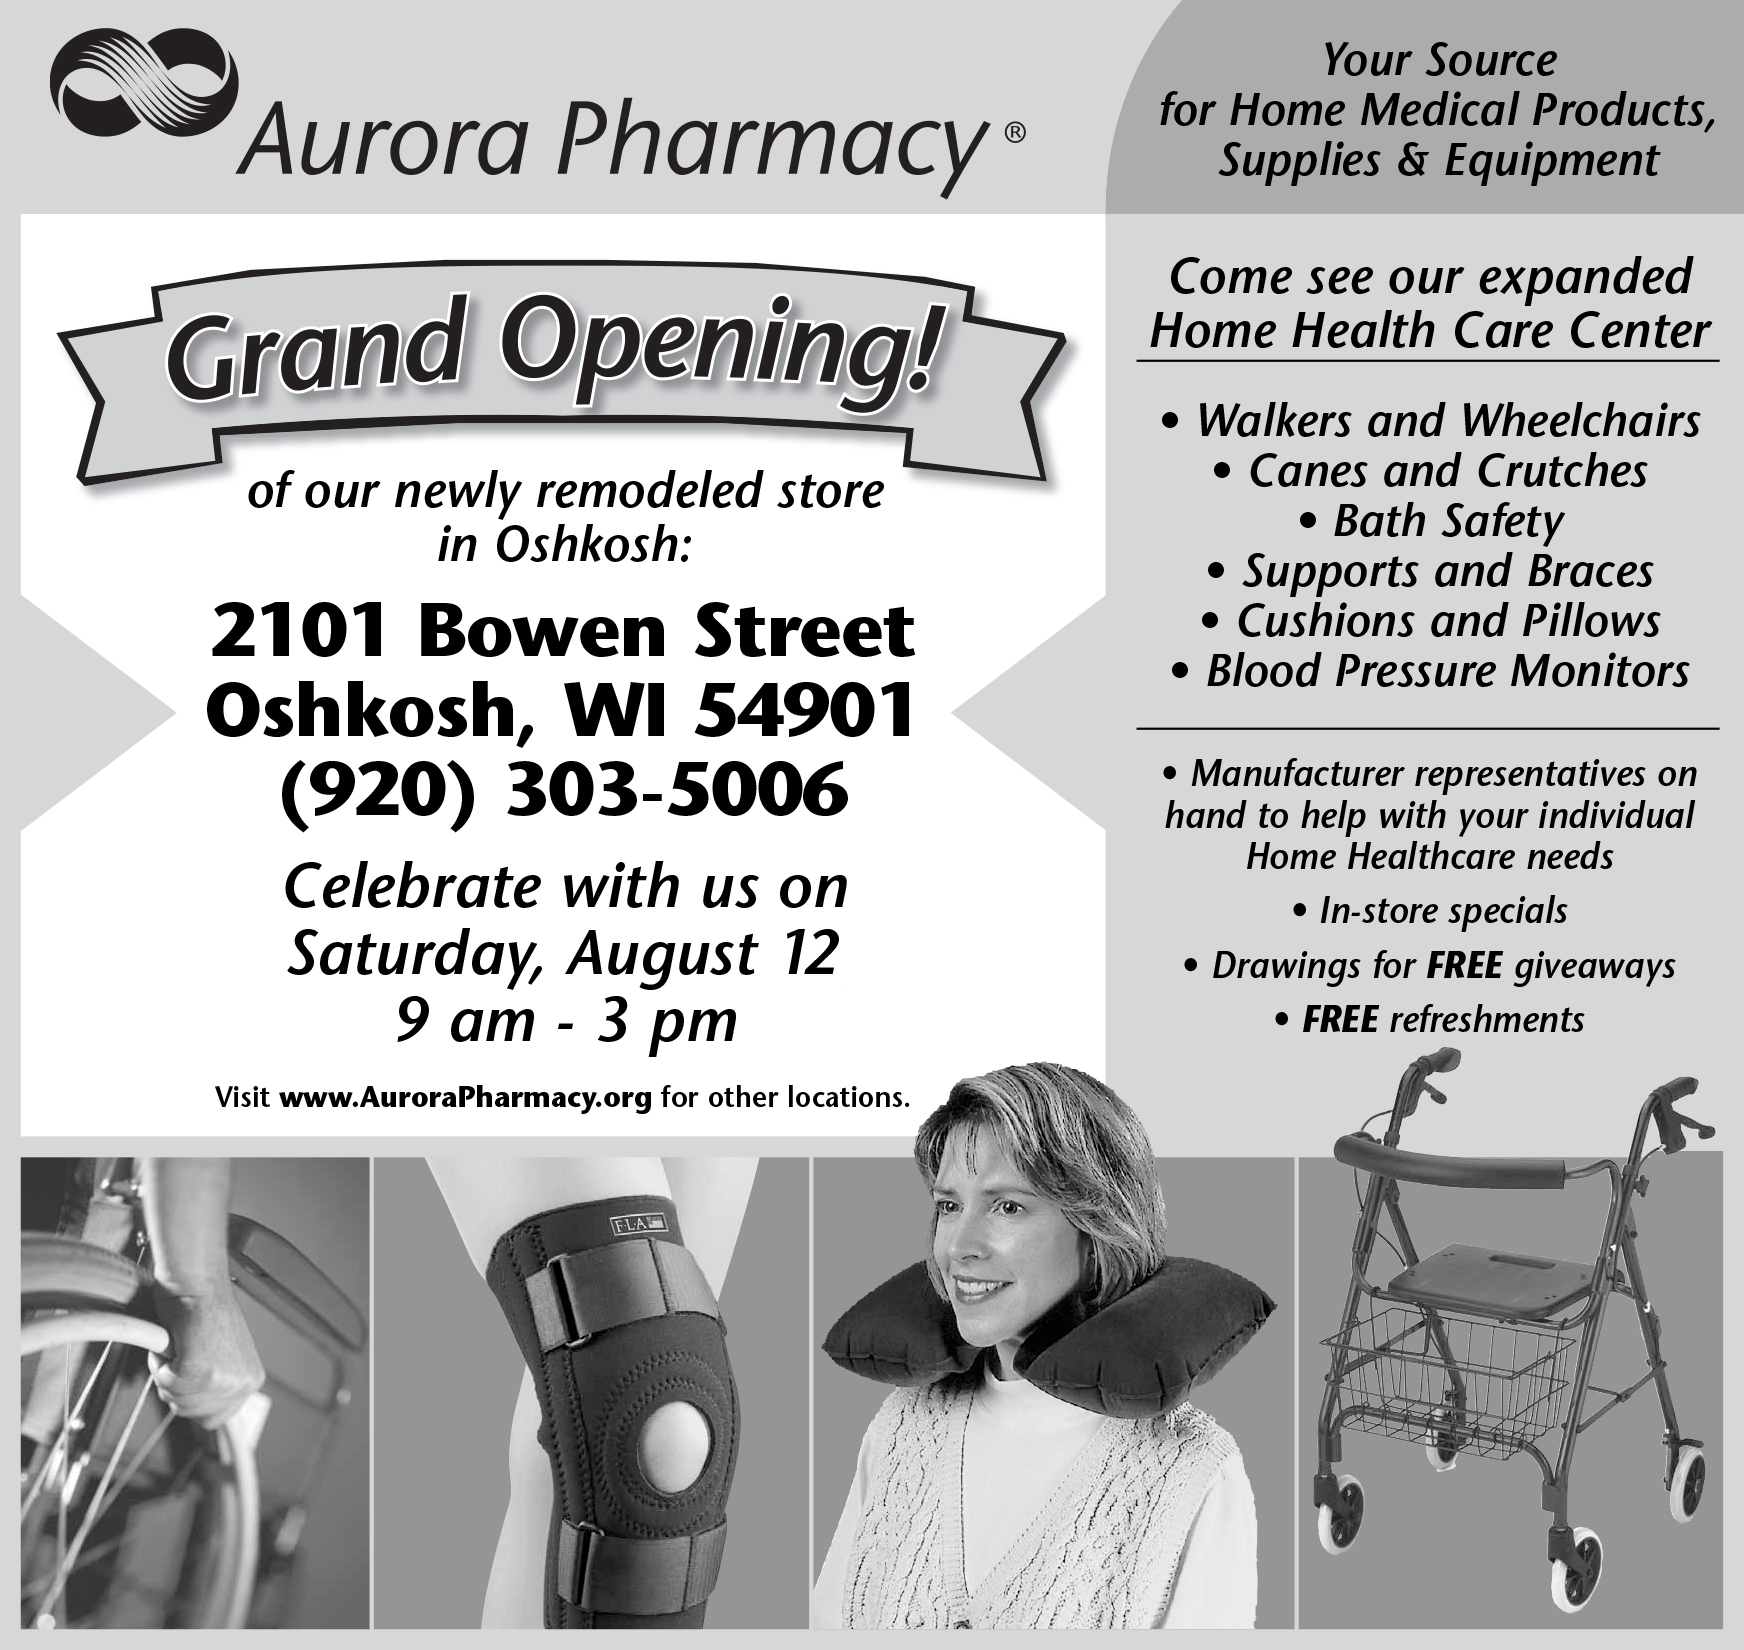 Aurora Pharmacy - Half Page Newspaper Ad